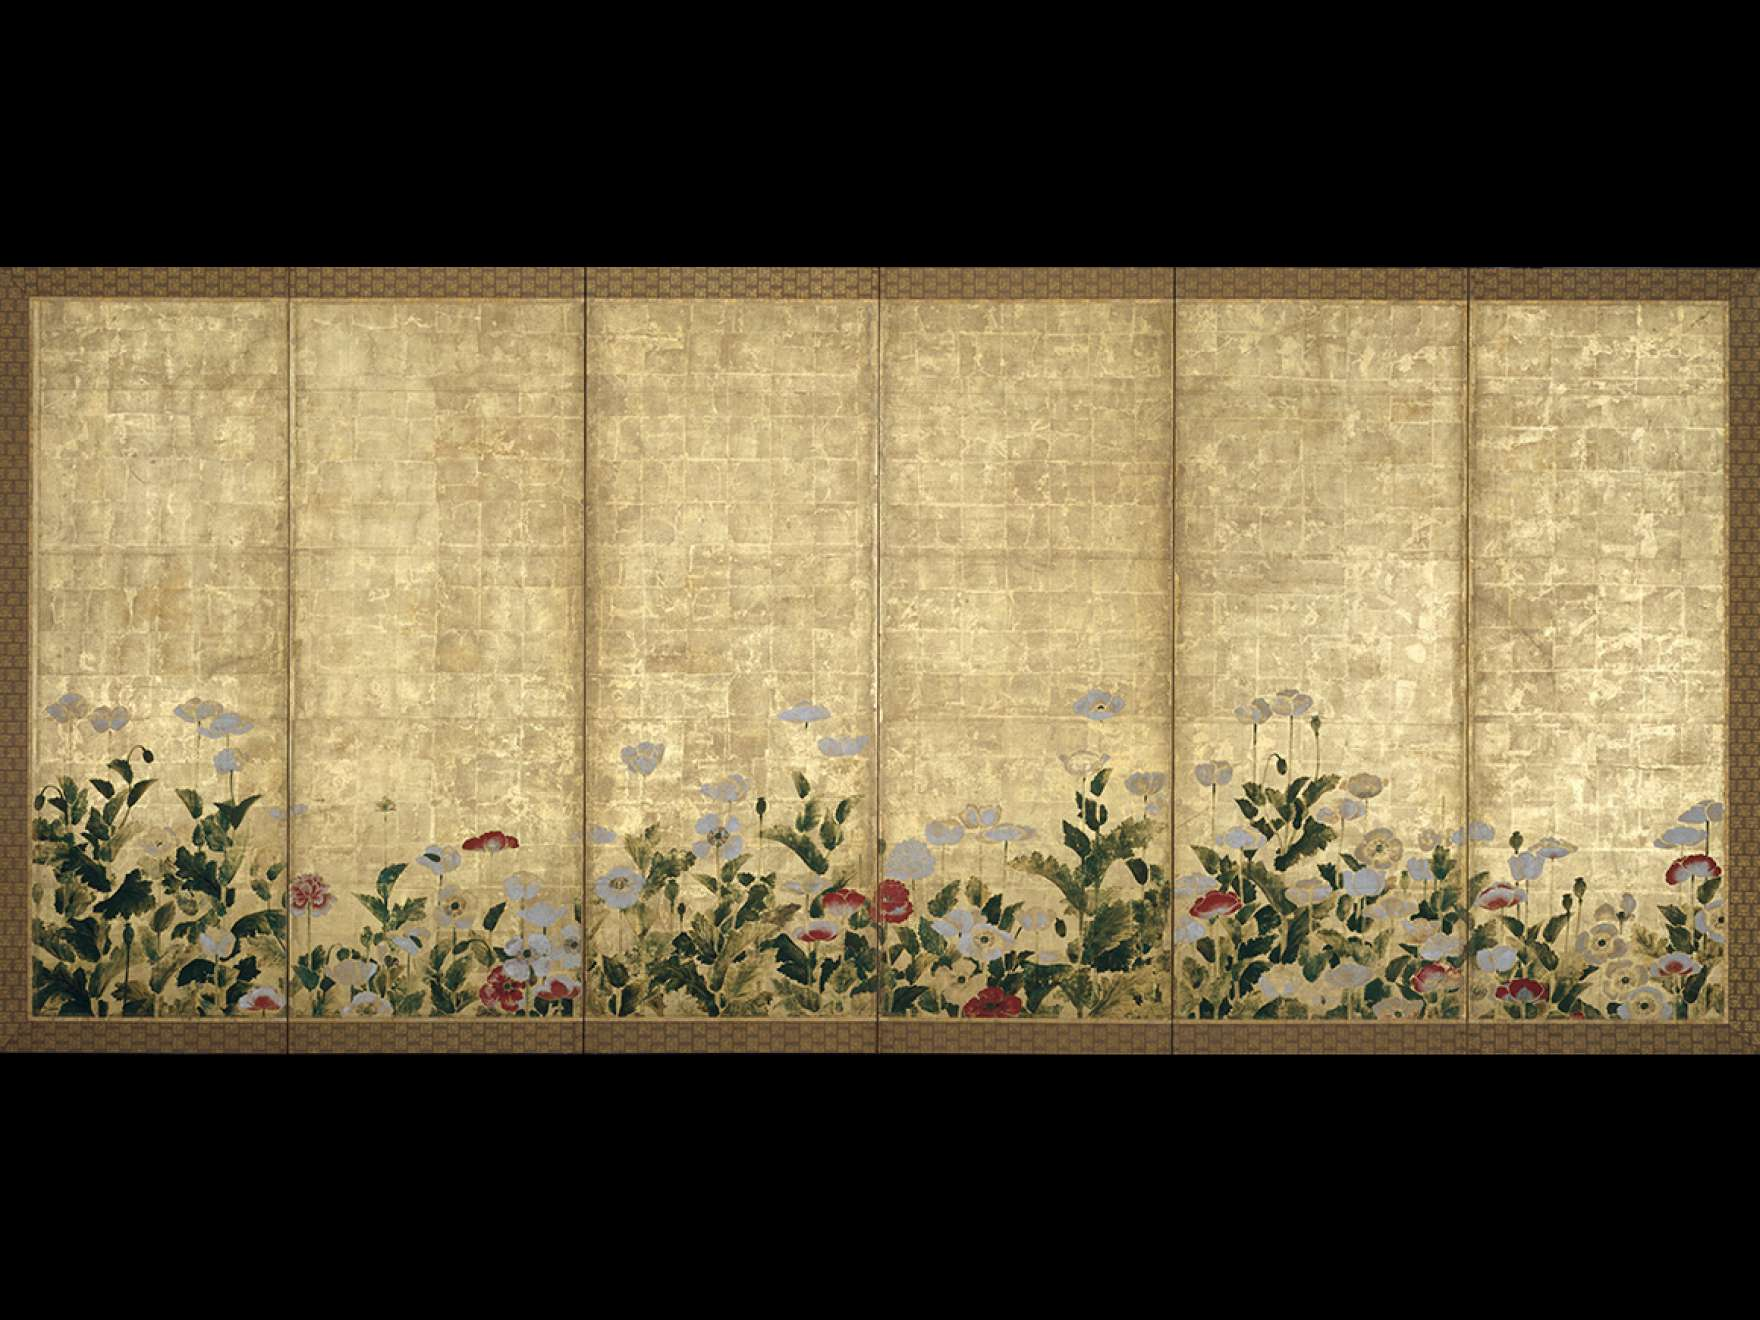 School of Tawaraya Sōtatsu, Poppies, 17th century